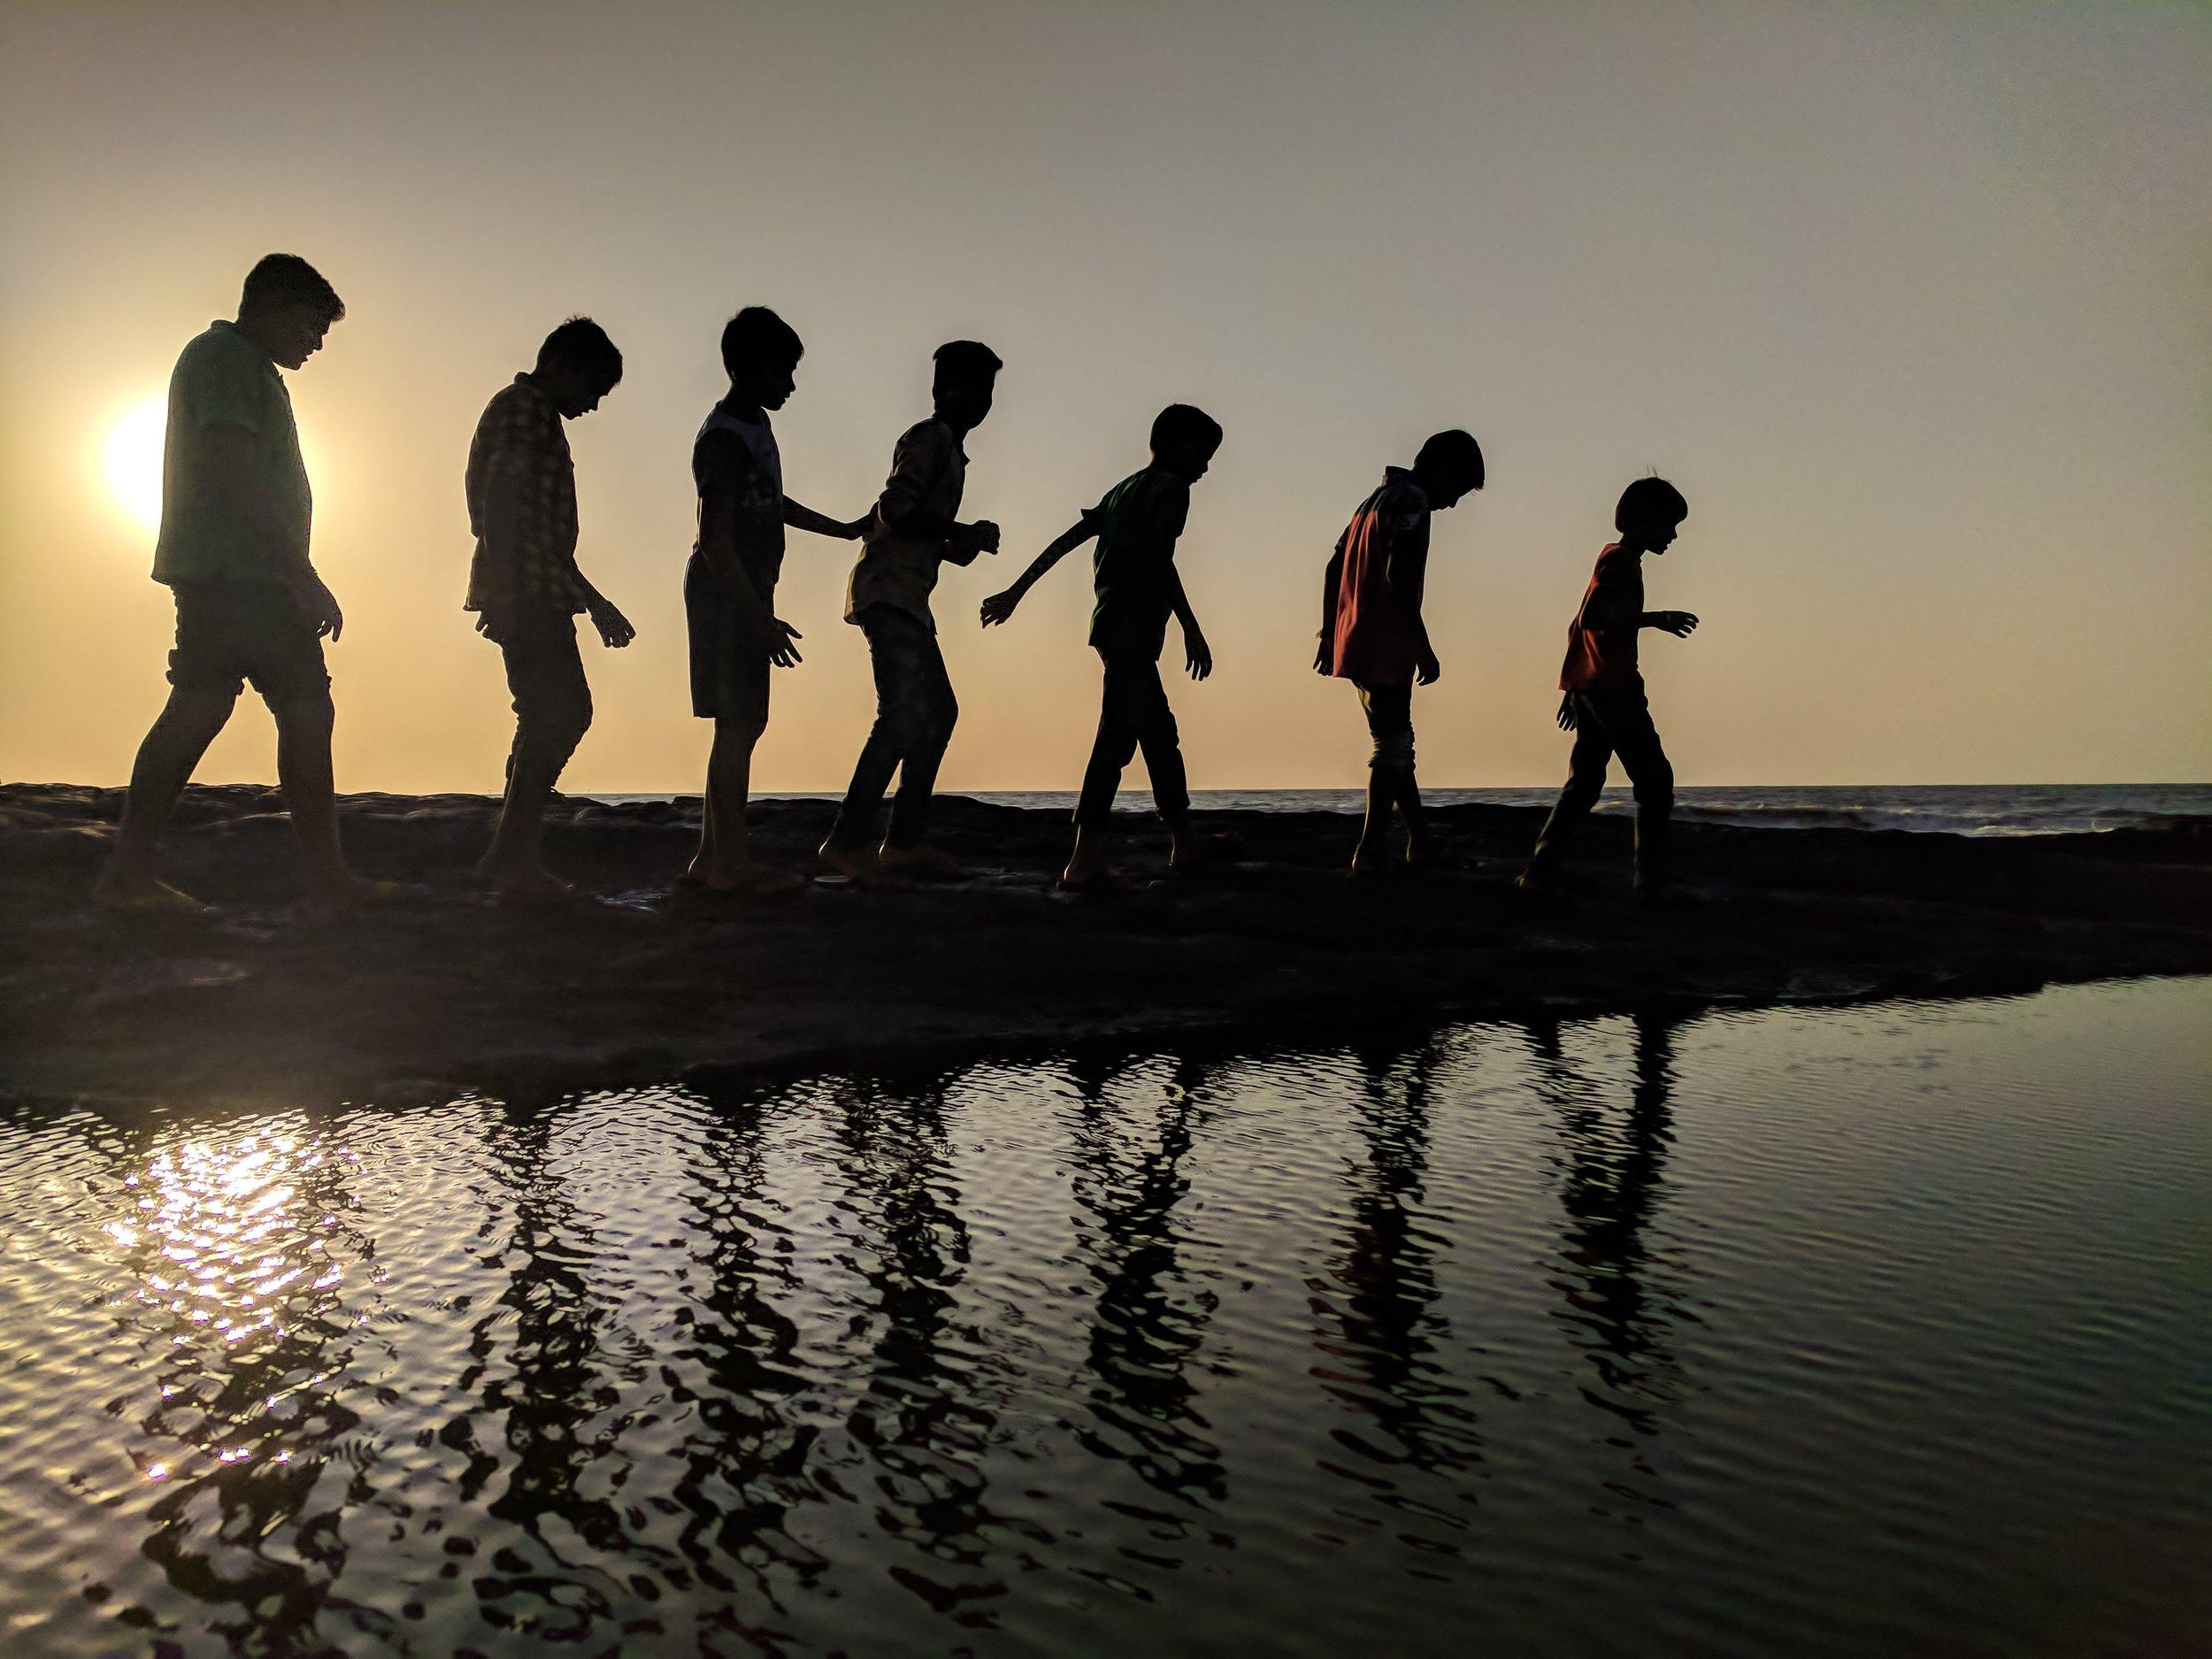 backlit-beach-children-939700.jpg